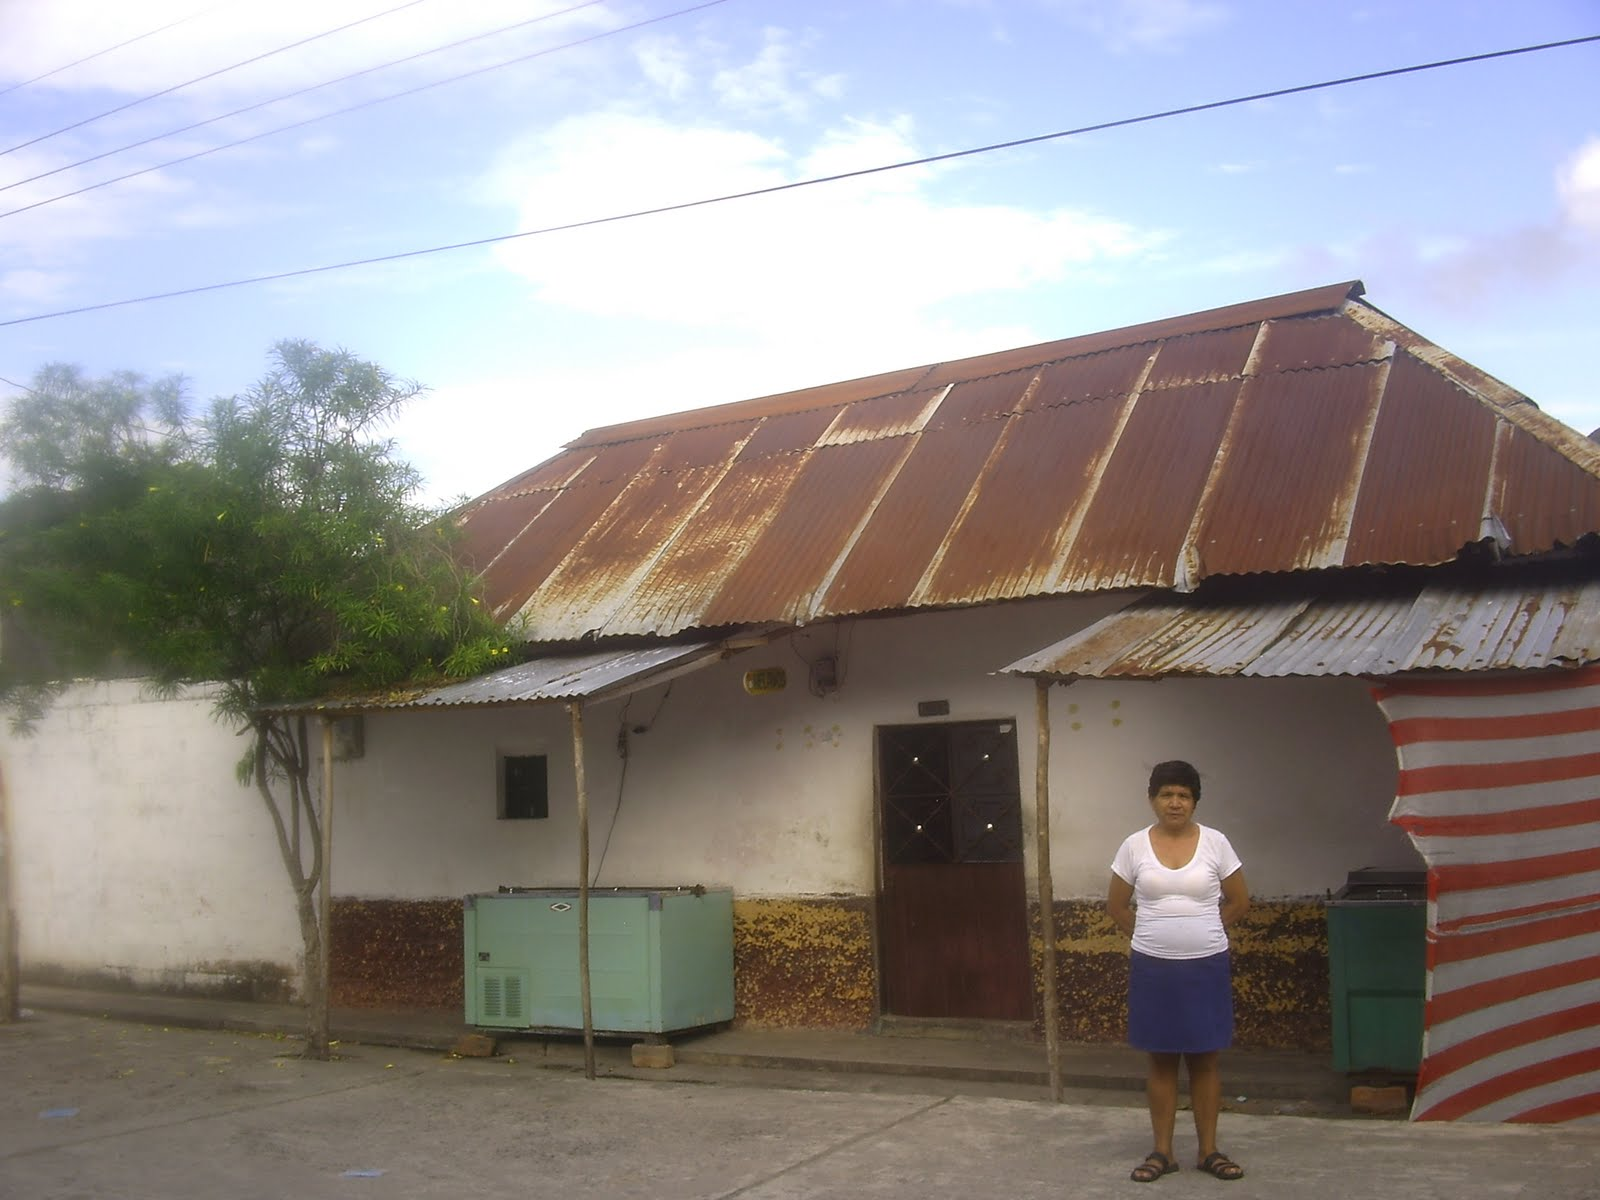 Escritores futuro 3000 i e d puerto bogota guaduas casas for Colores de techos de casas